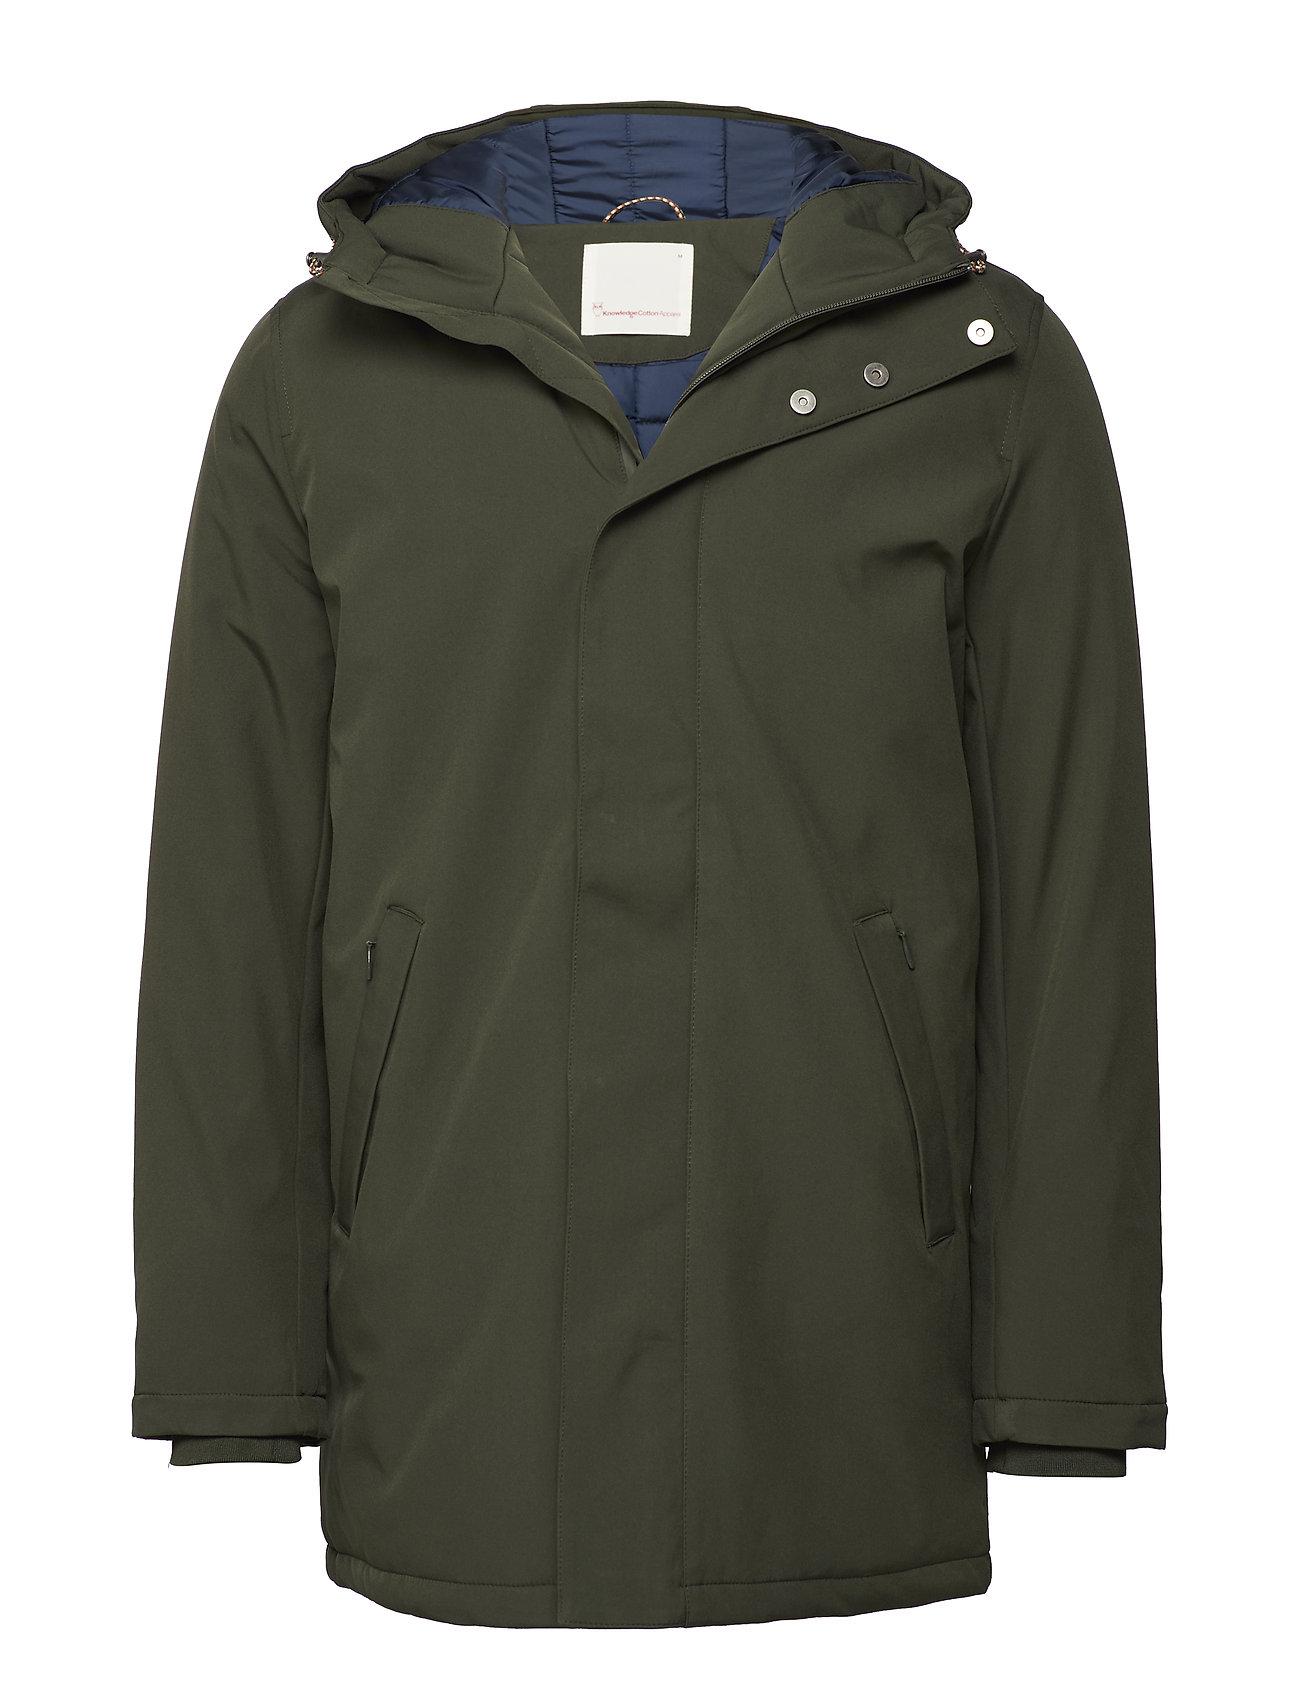 Knowledge Cotton Apparel Long Soft Shell Quilted Jacket GR Ytterkläder